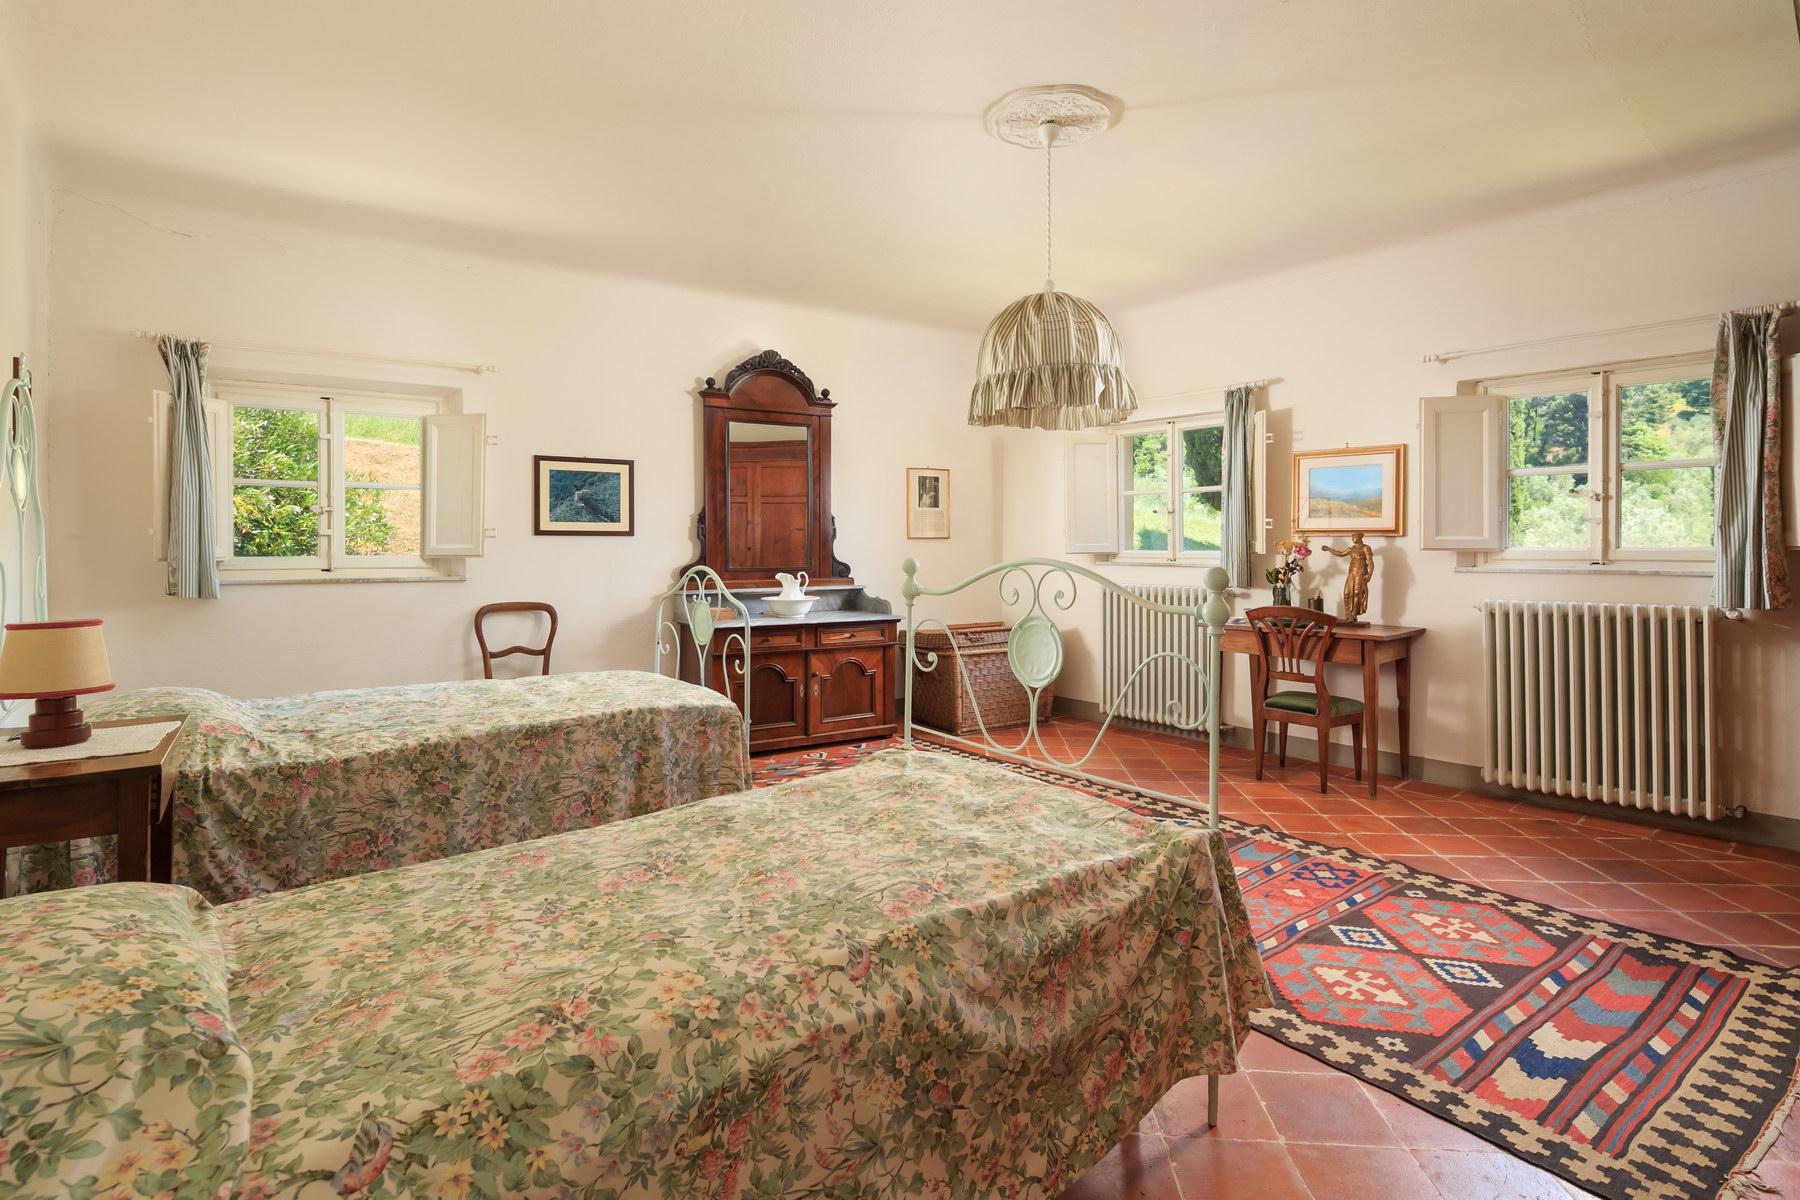 Villa in Vendita a Lucca: 5 locali, 1500 mq - Foto 13